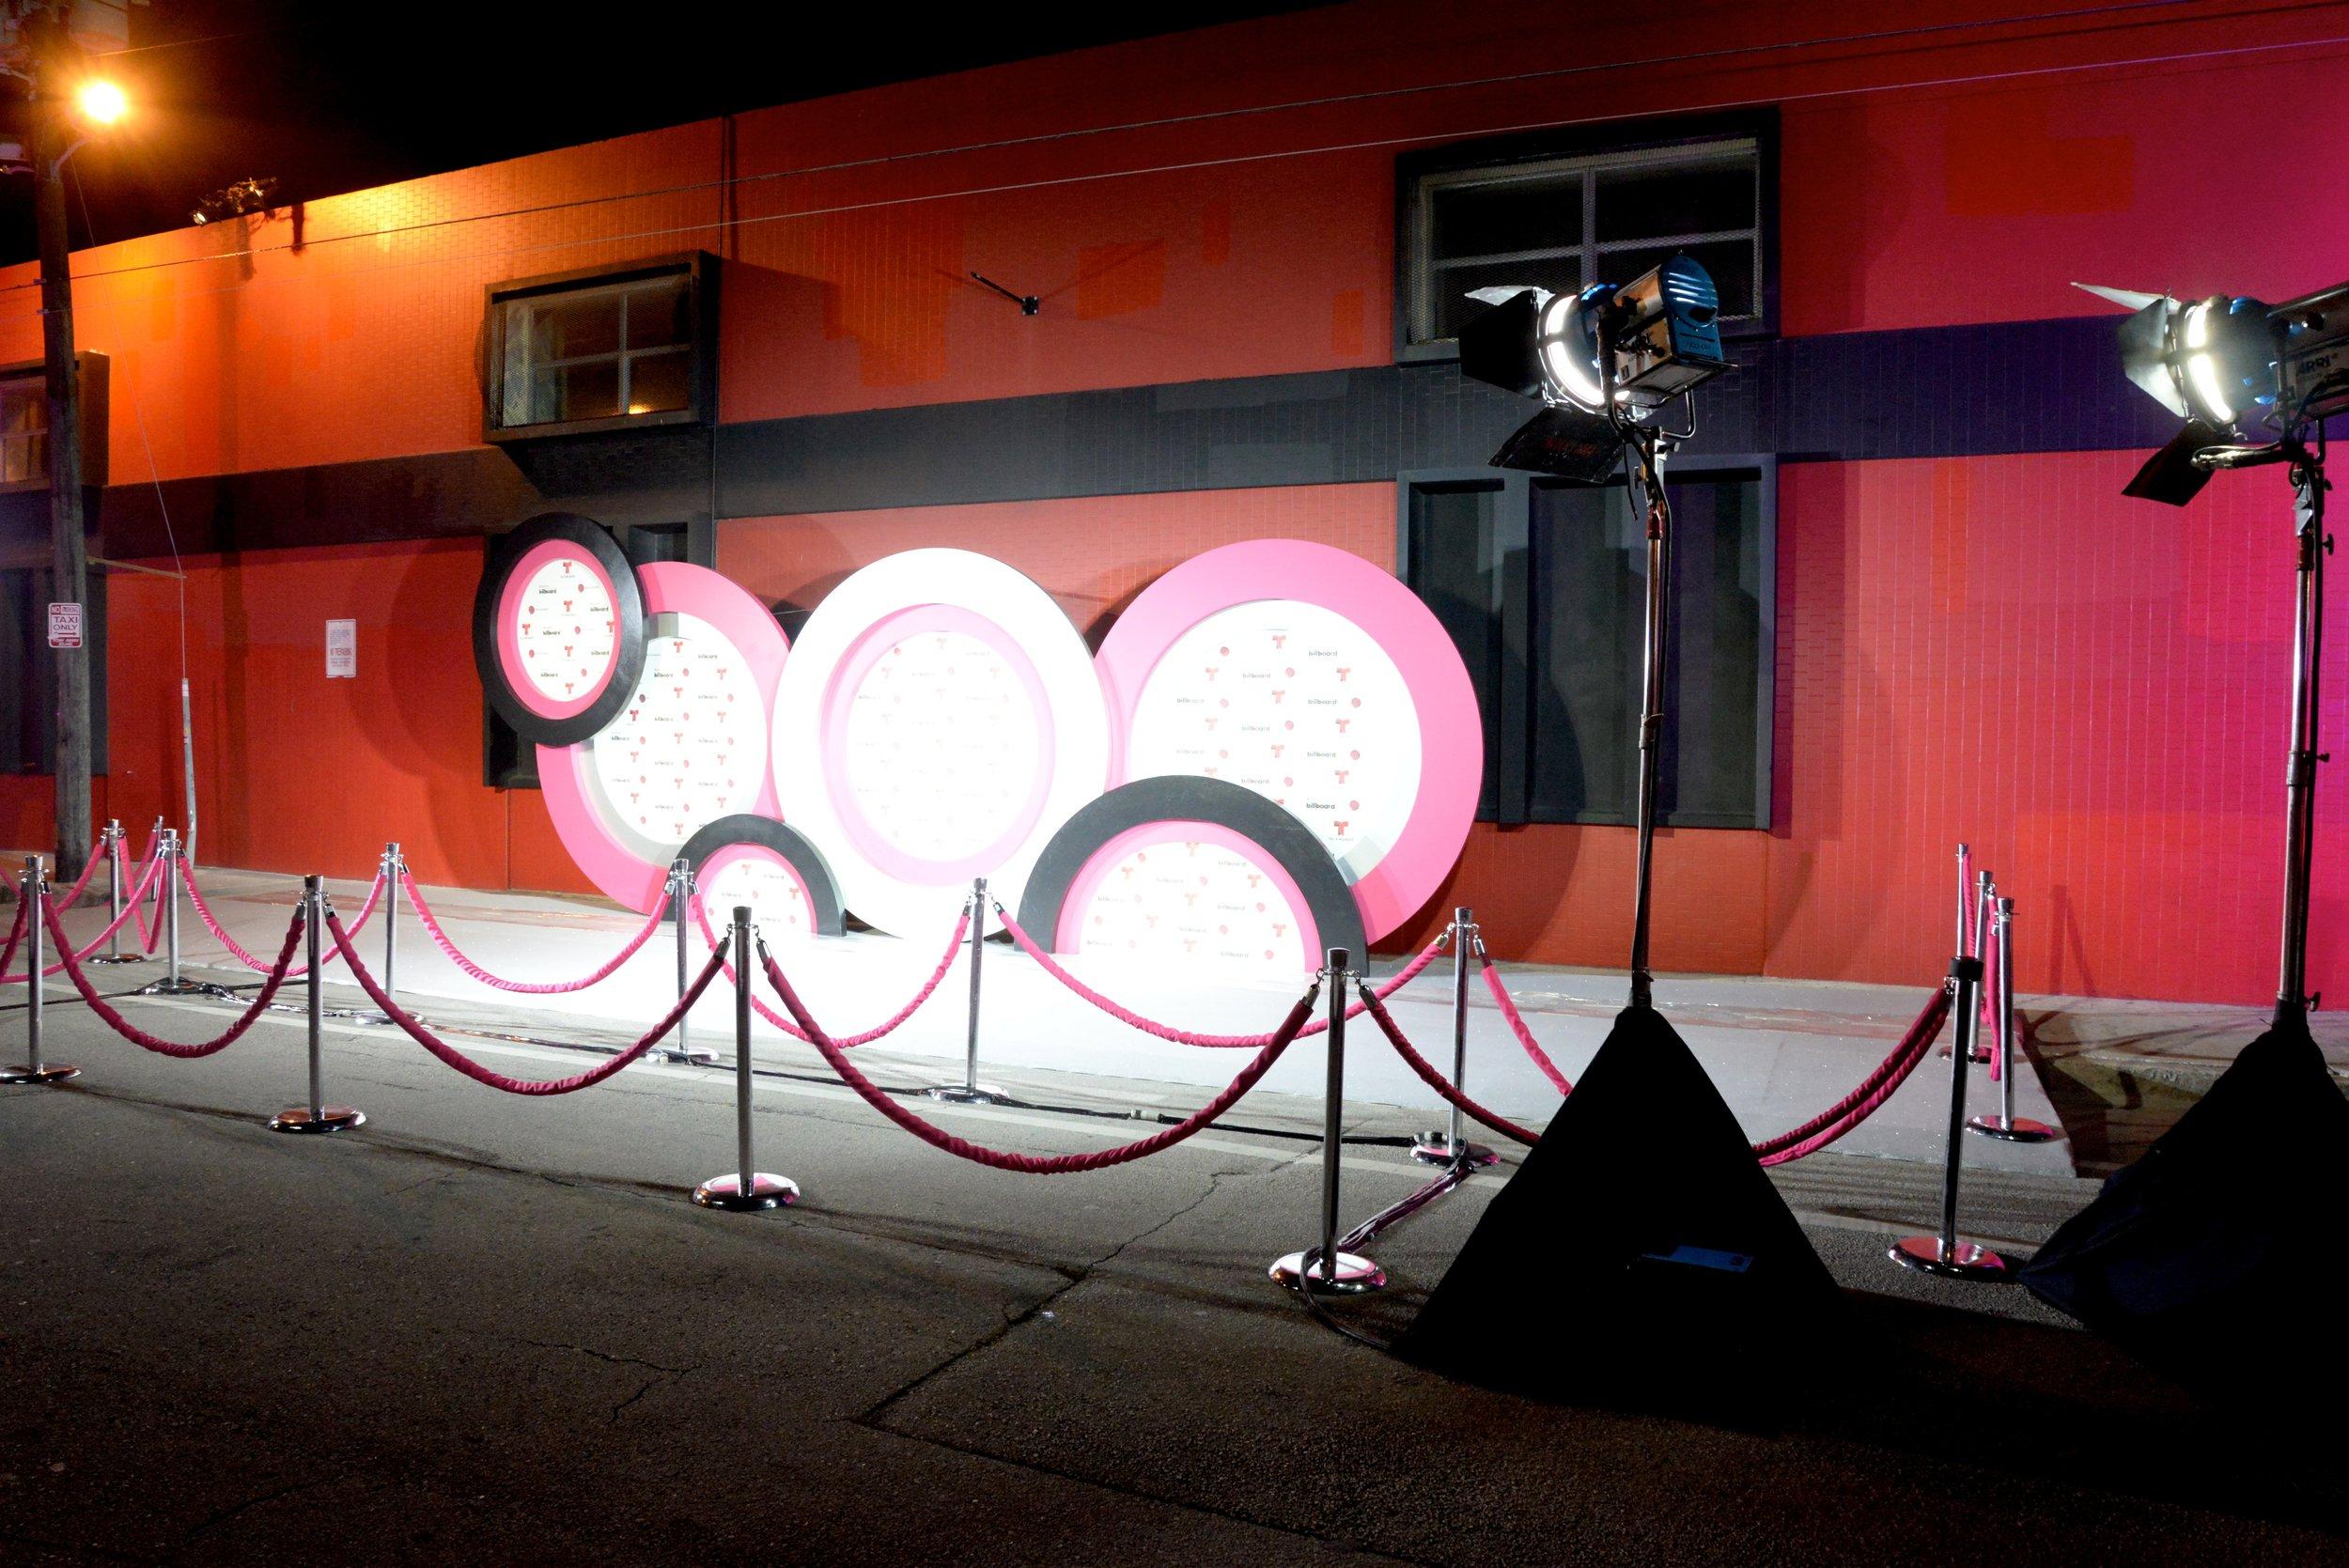 SOHO_Studios_Telemundo_Billboard_MH_3077.JPG